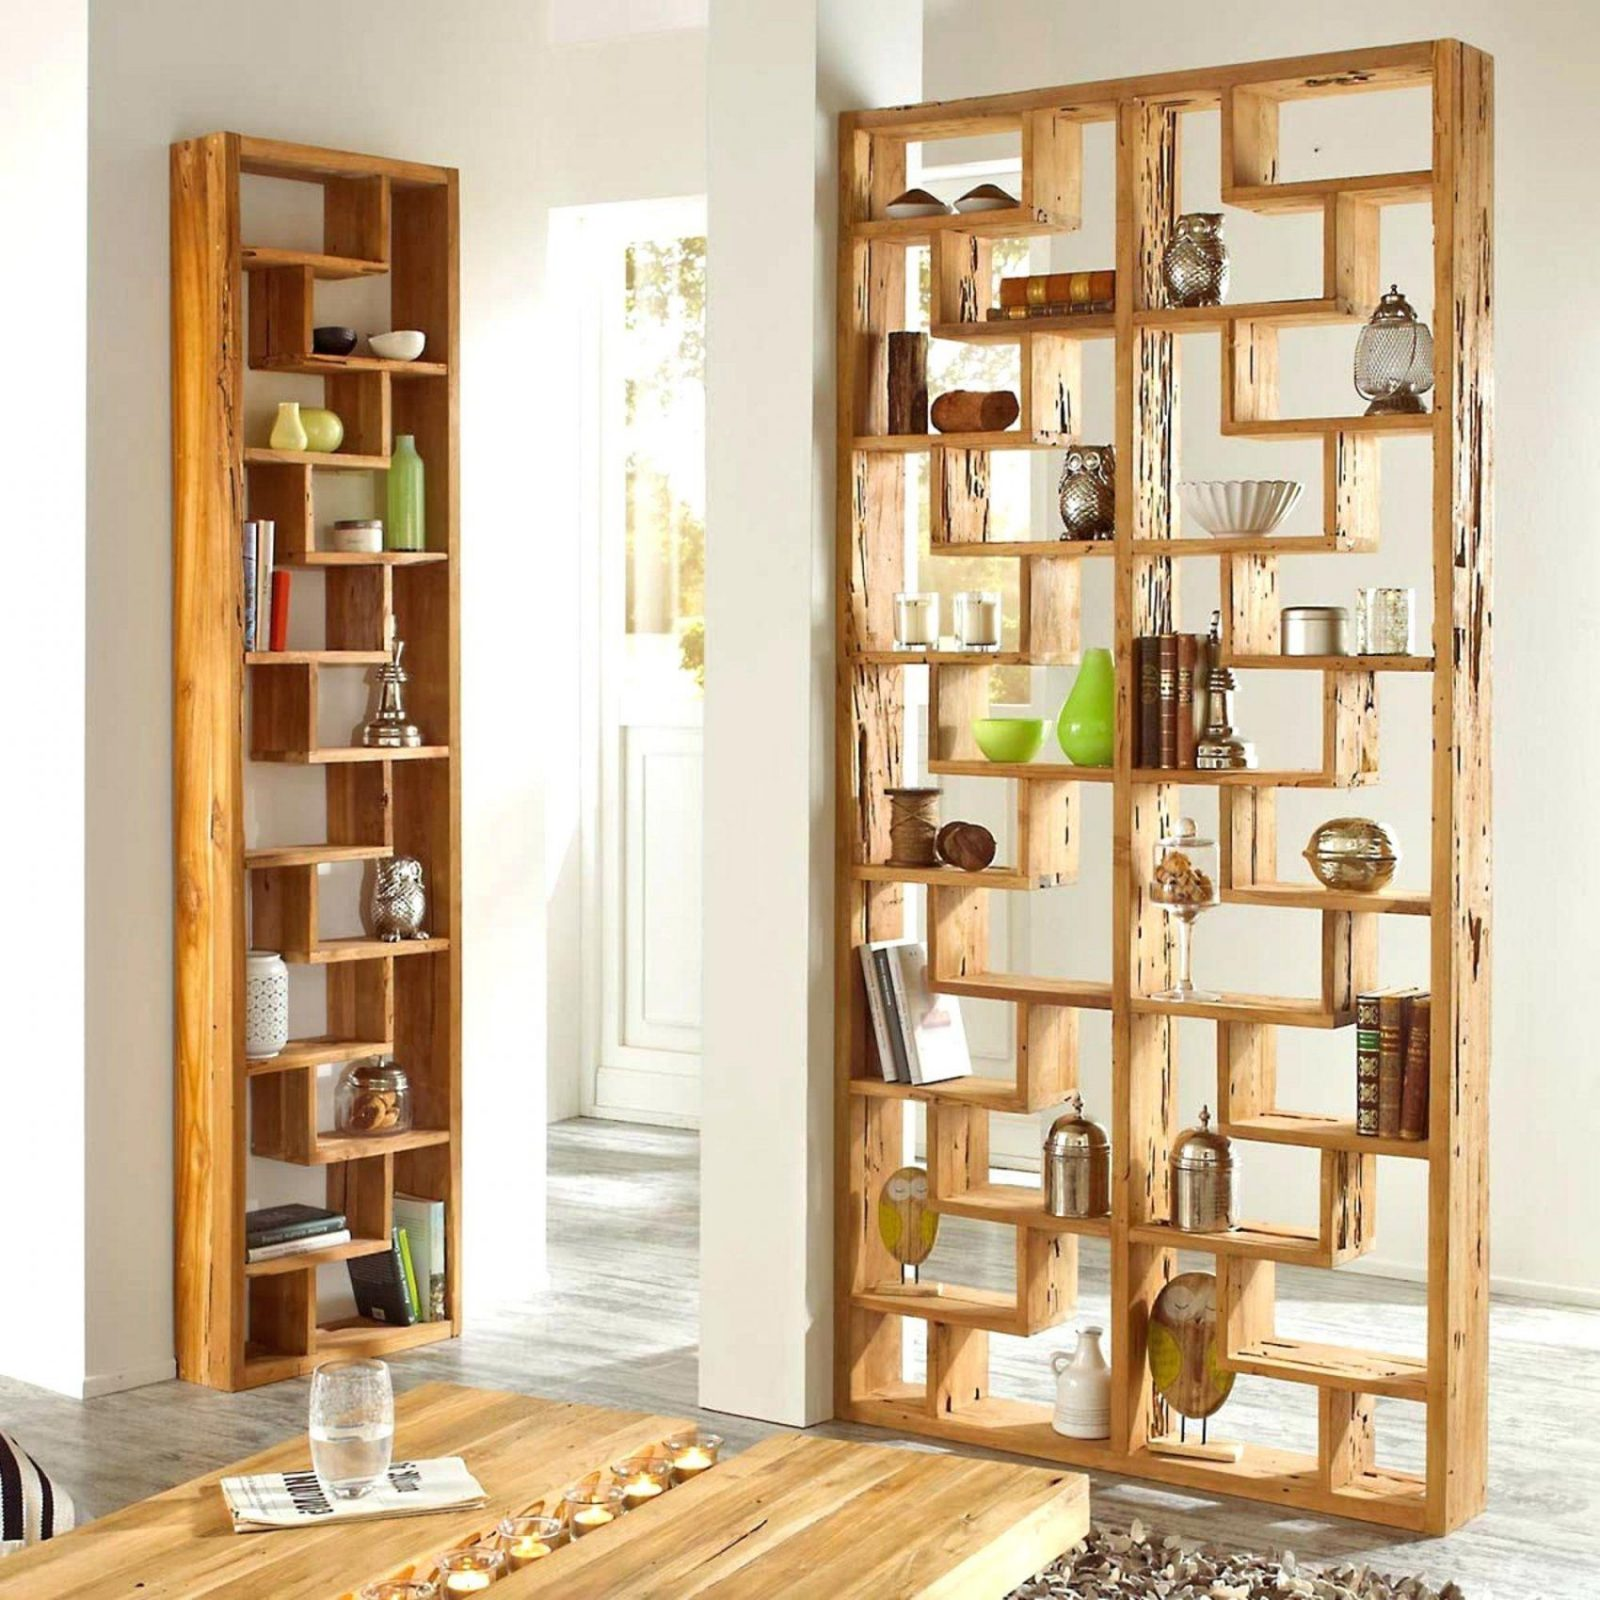 regal selbst bauen anleitung regal aus paletten bauen anleitung bild genial regal aus. Black Bedroom Furniture Sets. Home Design Ideas